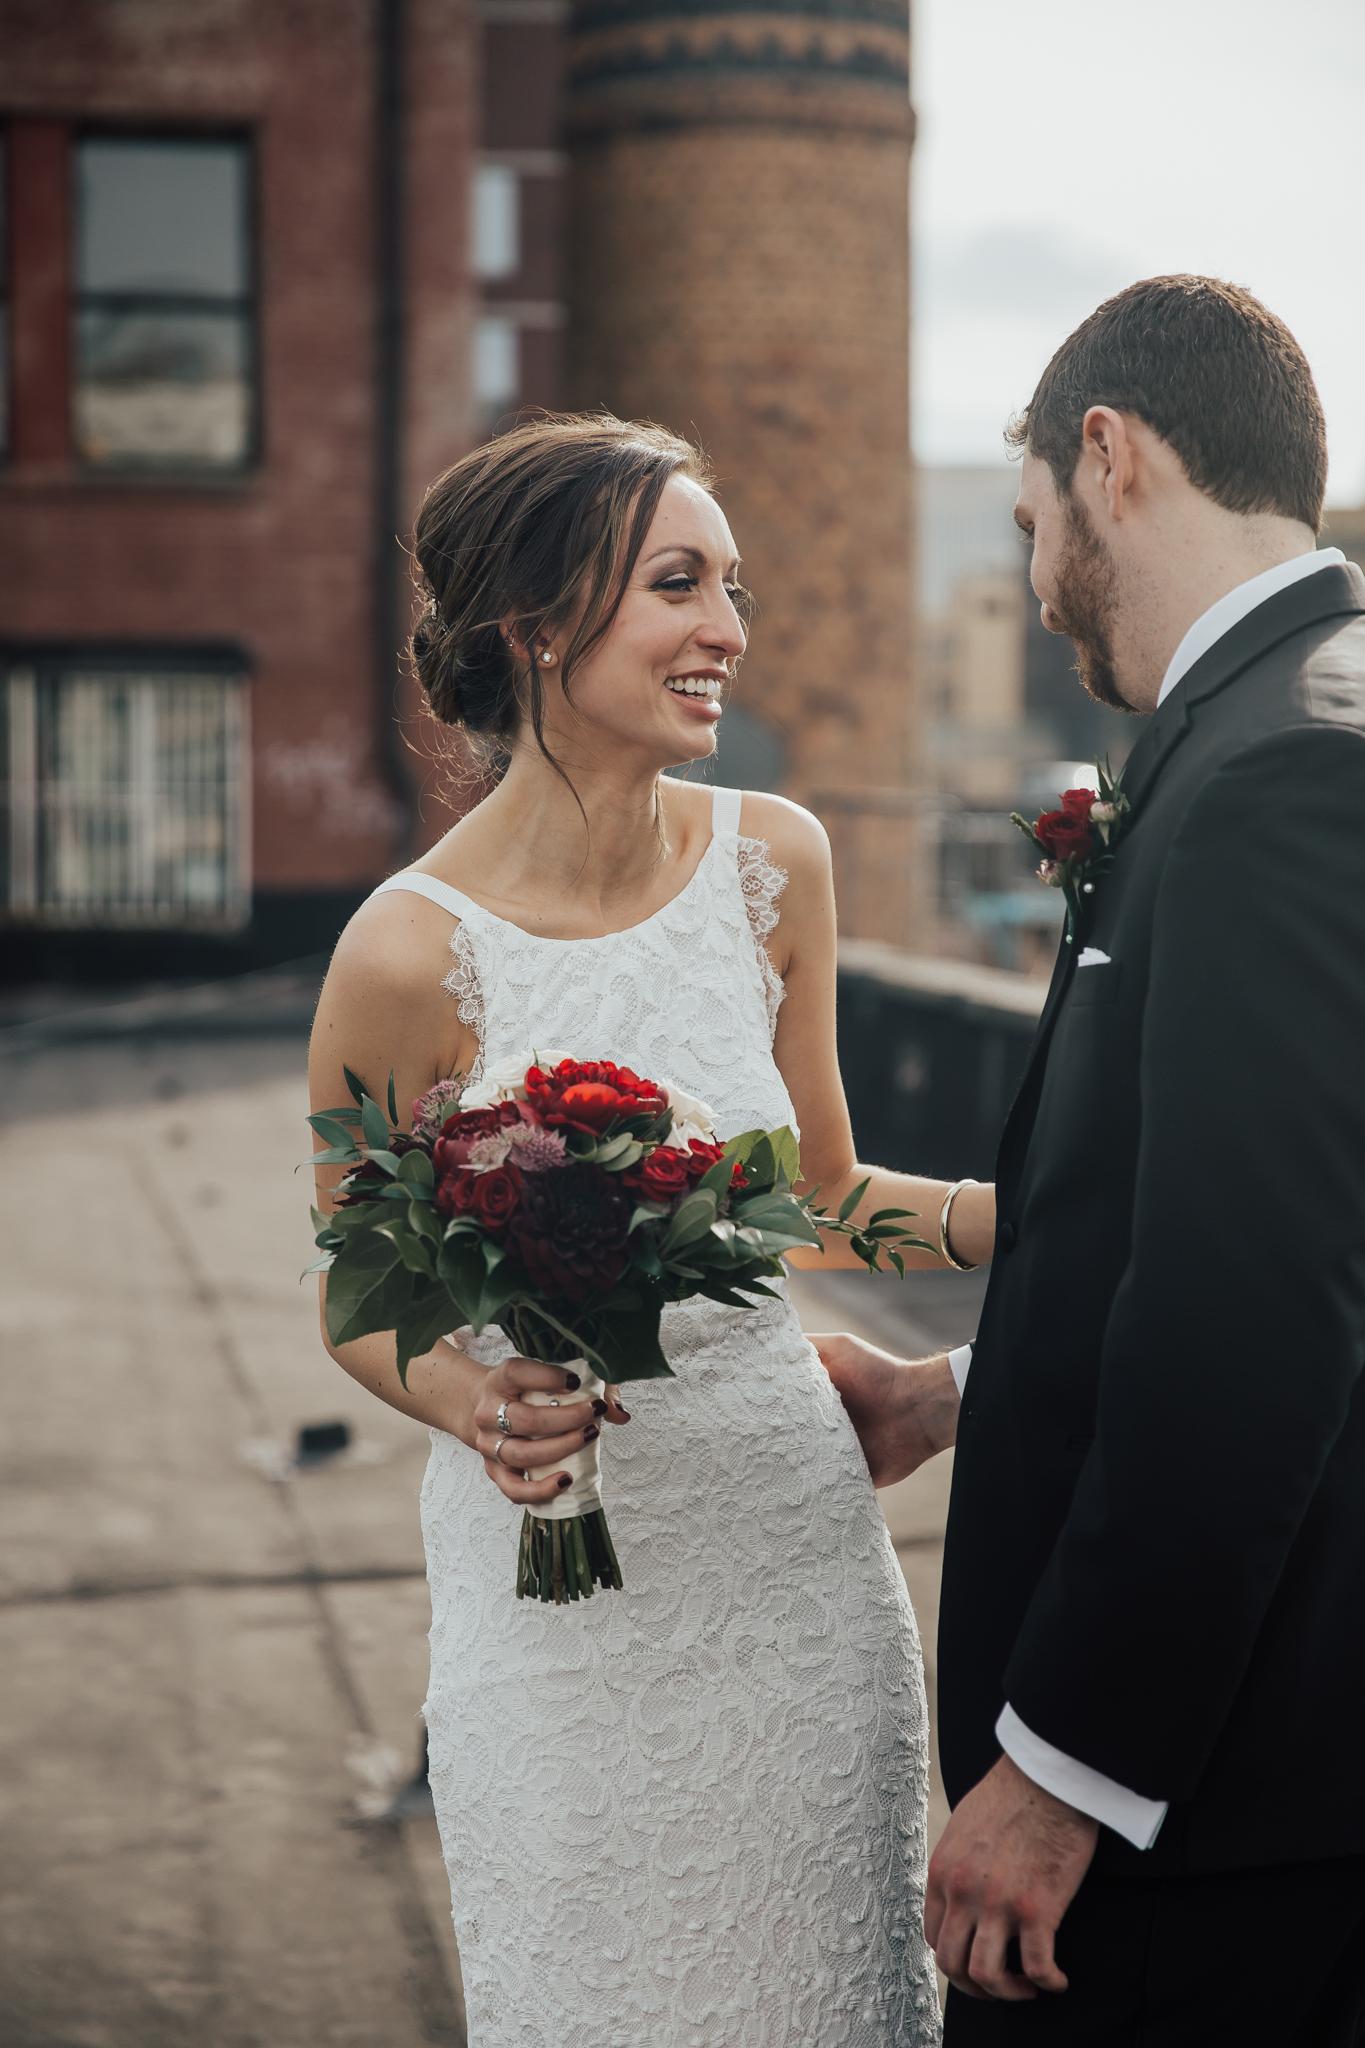 26-bridge-wedding-brooklyn-011.JPG